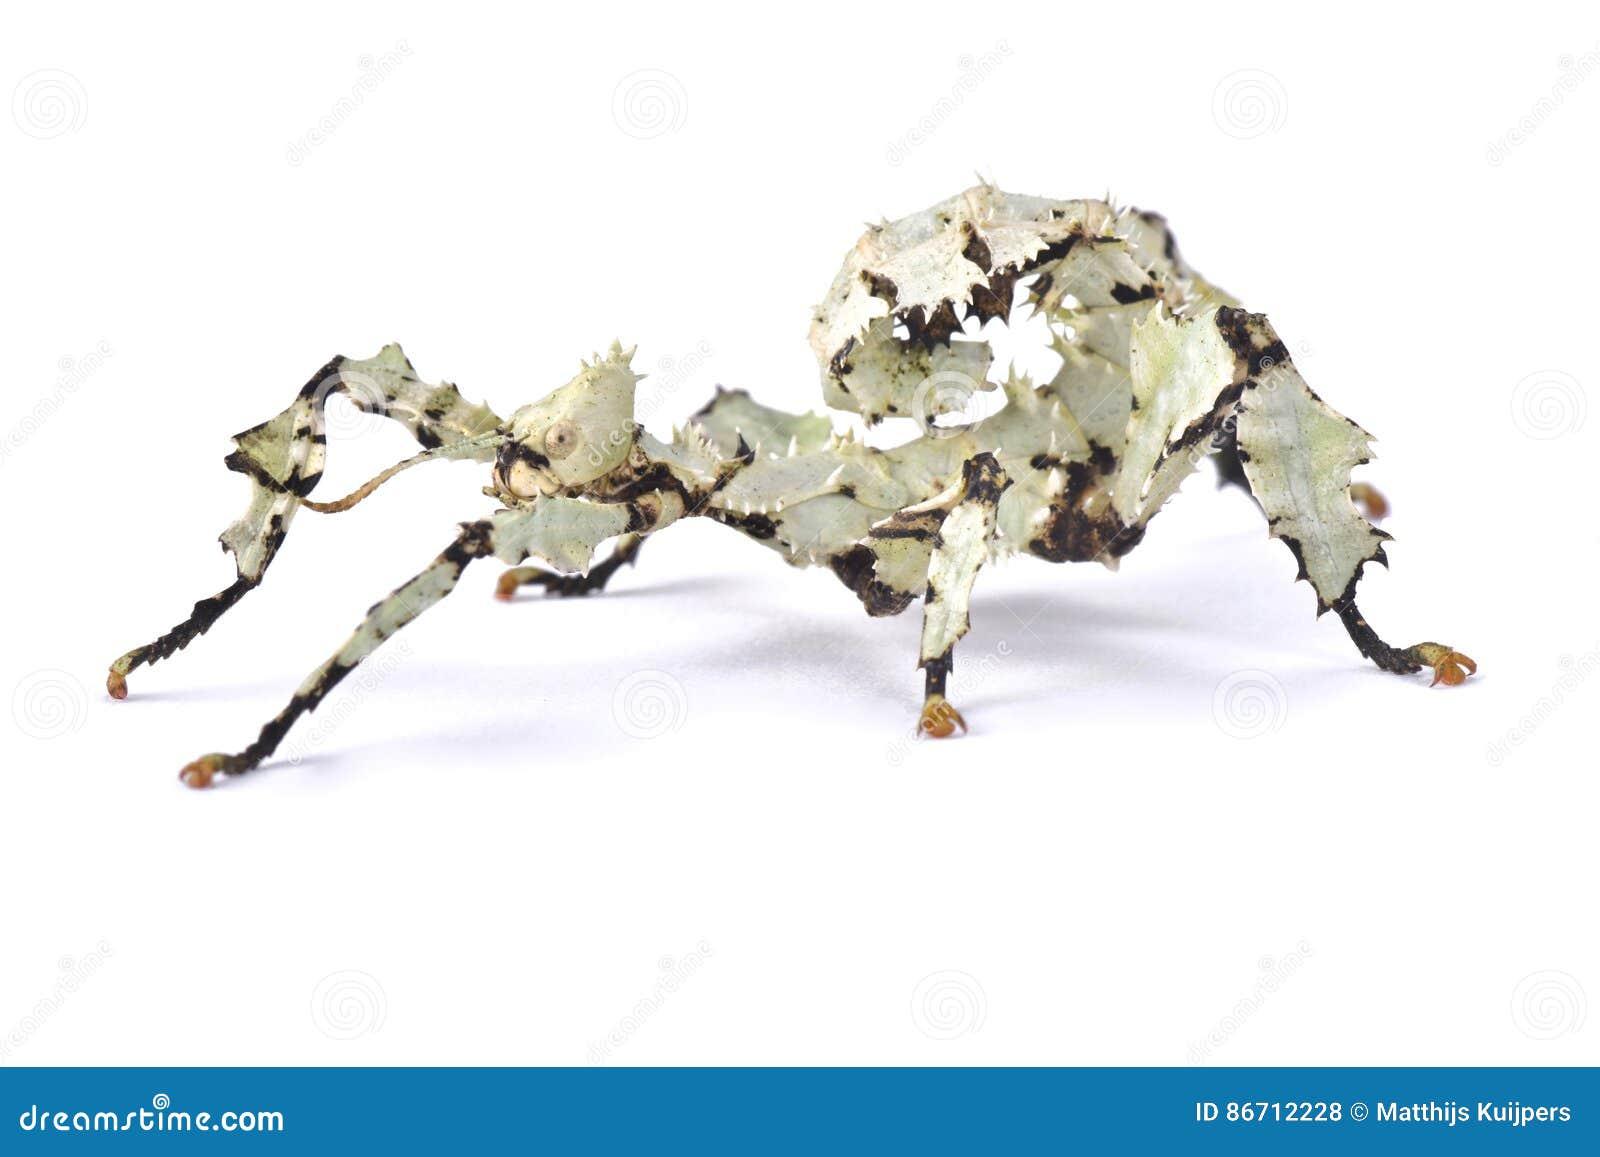 Insecto de palillo espinoso gigante, tiaratum de Extatosoma